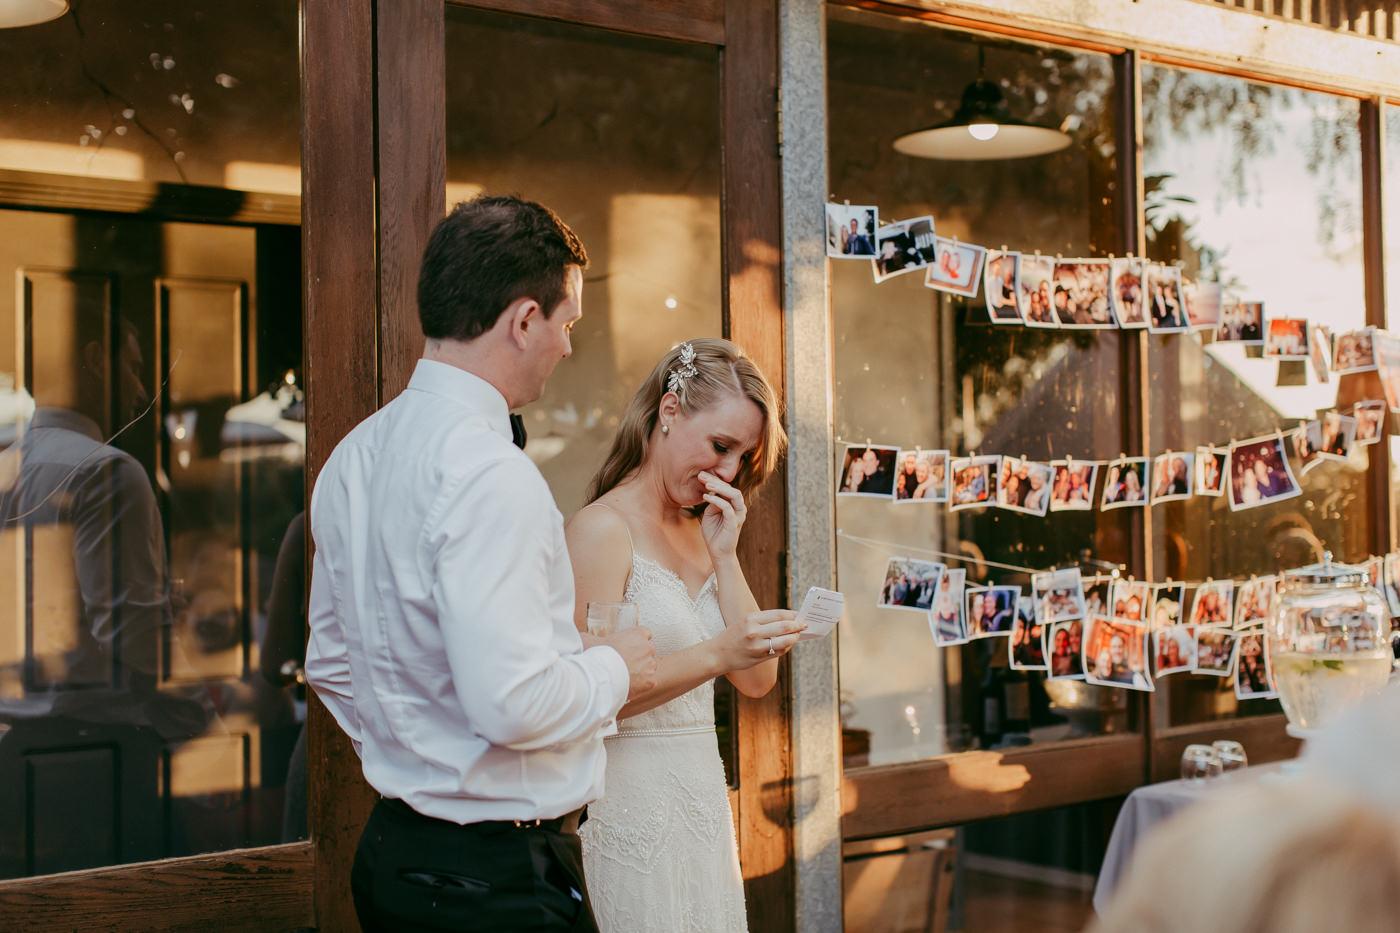 Anthony & Eliet - Wagga Wagga Wedding - Country NSW - Samantha Heather Photography-146.jpg